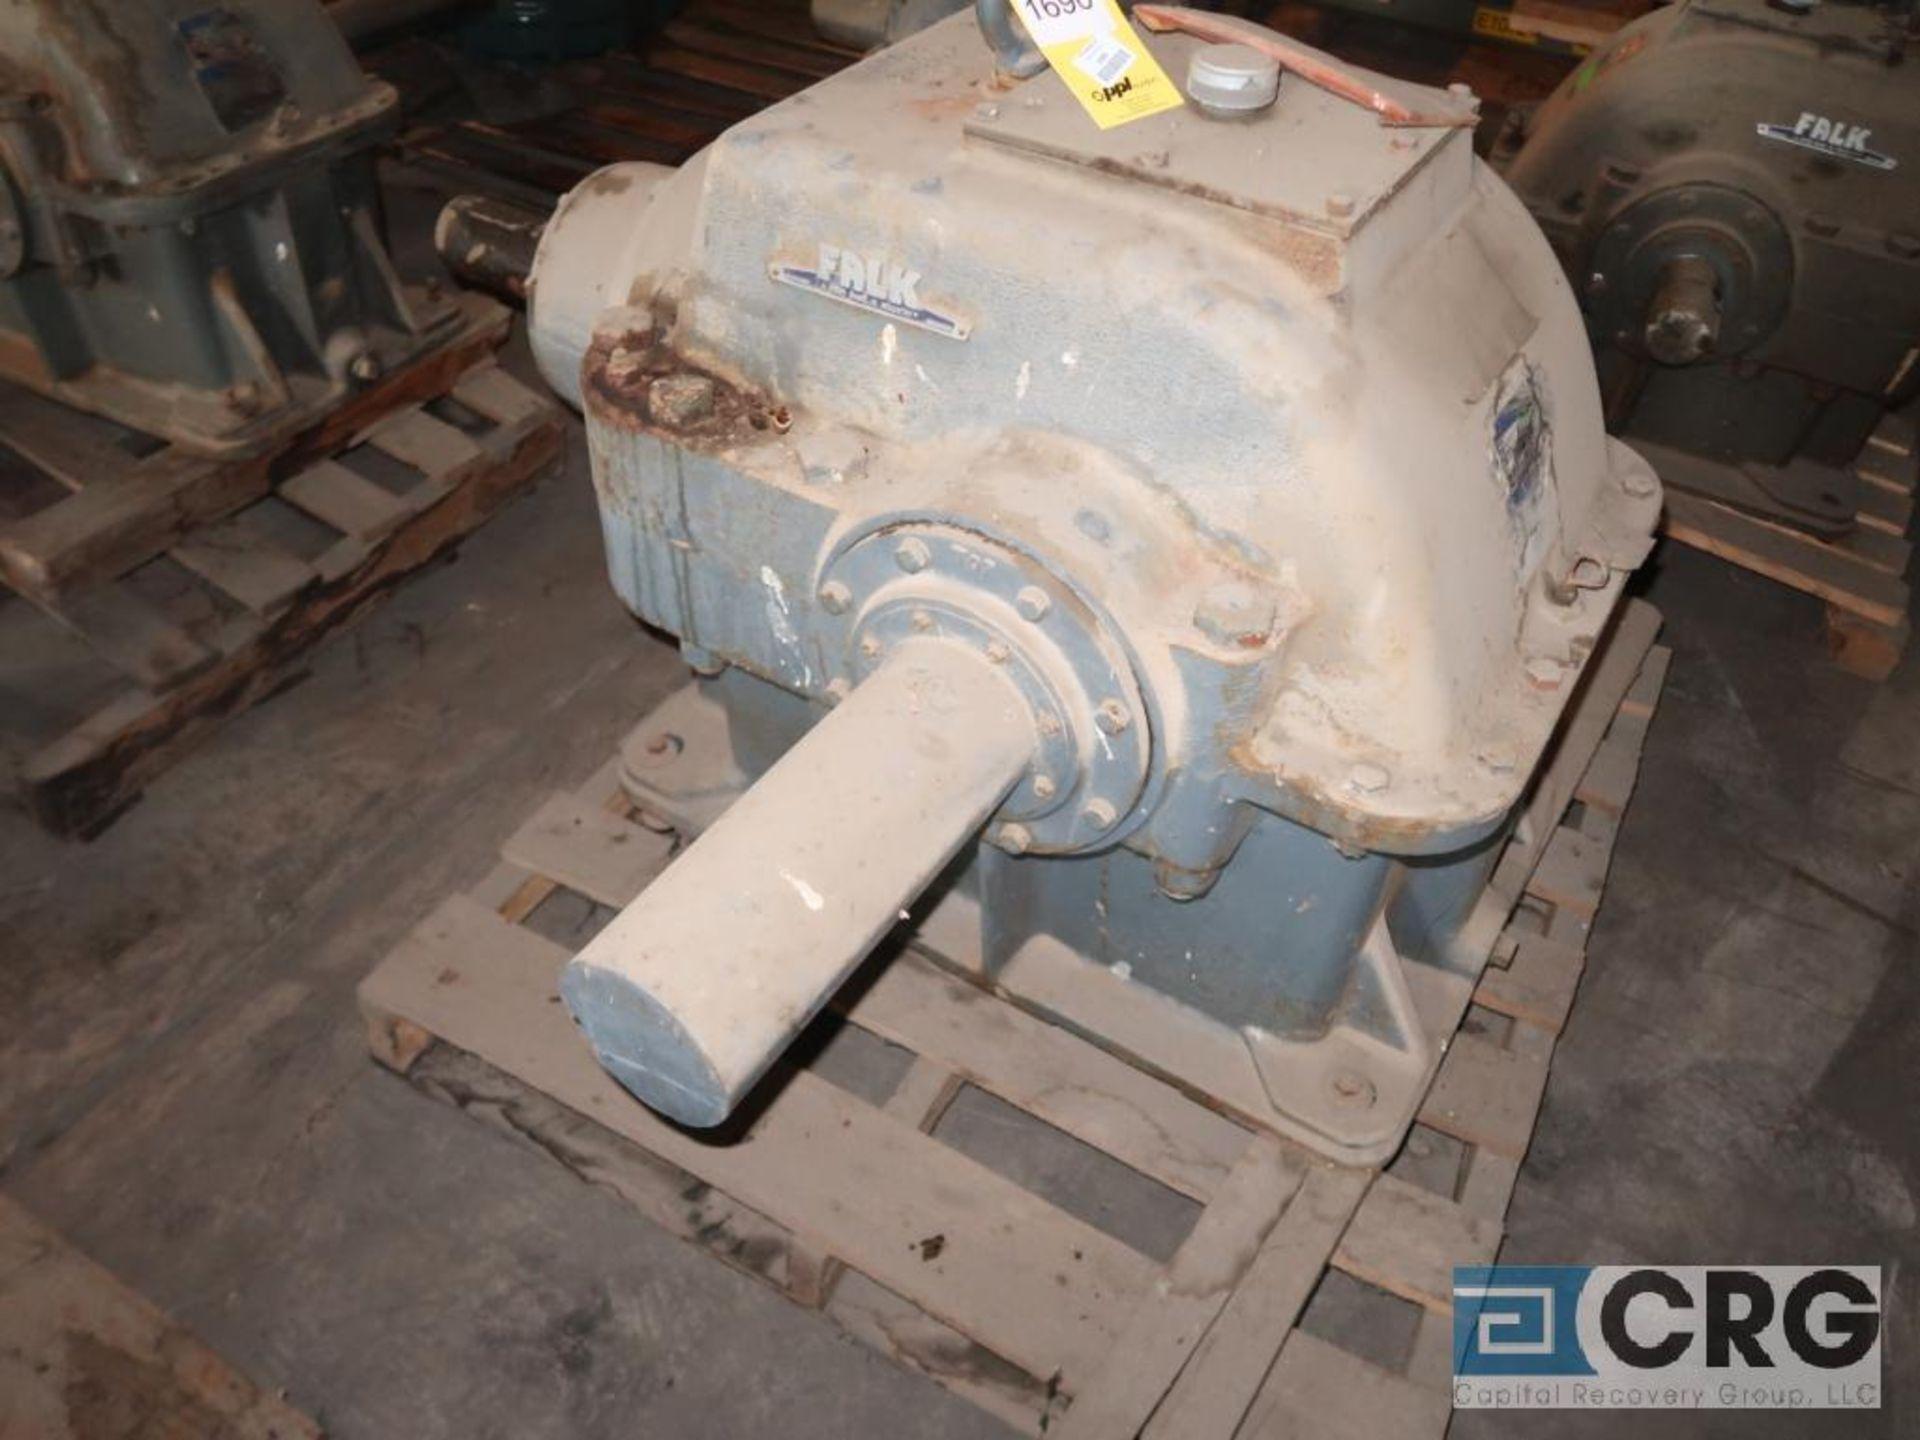 Falk 2100 GH81 KS gear drive, ratio-2.455, input RPM 403, output RPM 164, service rate HP. 232, s/